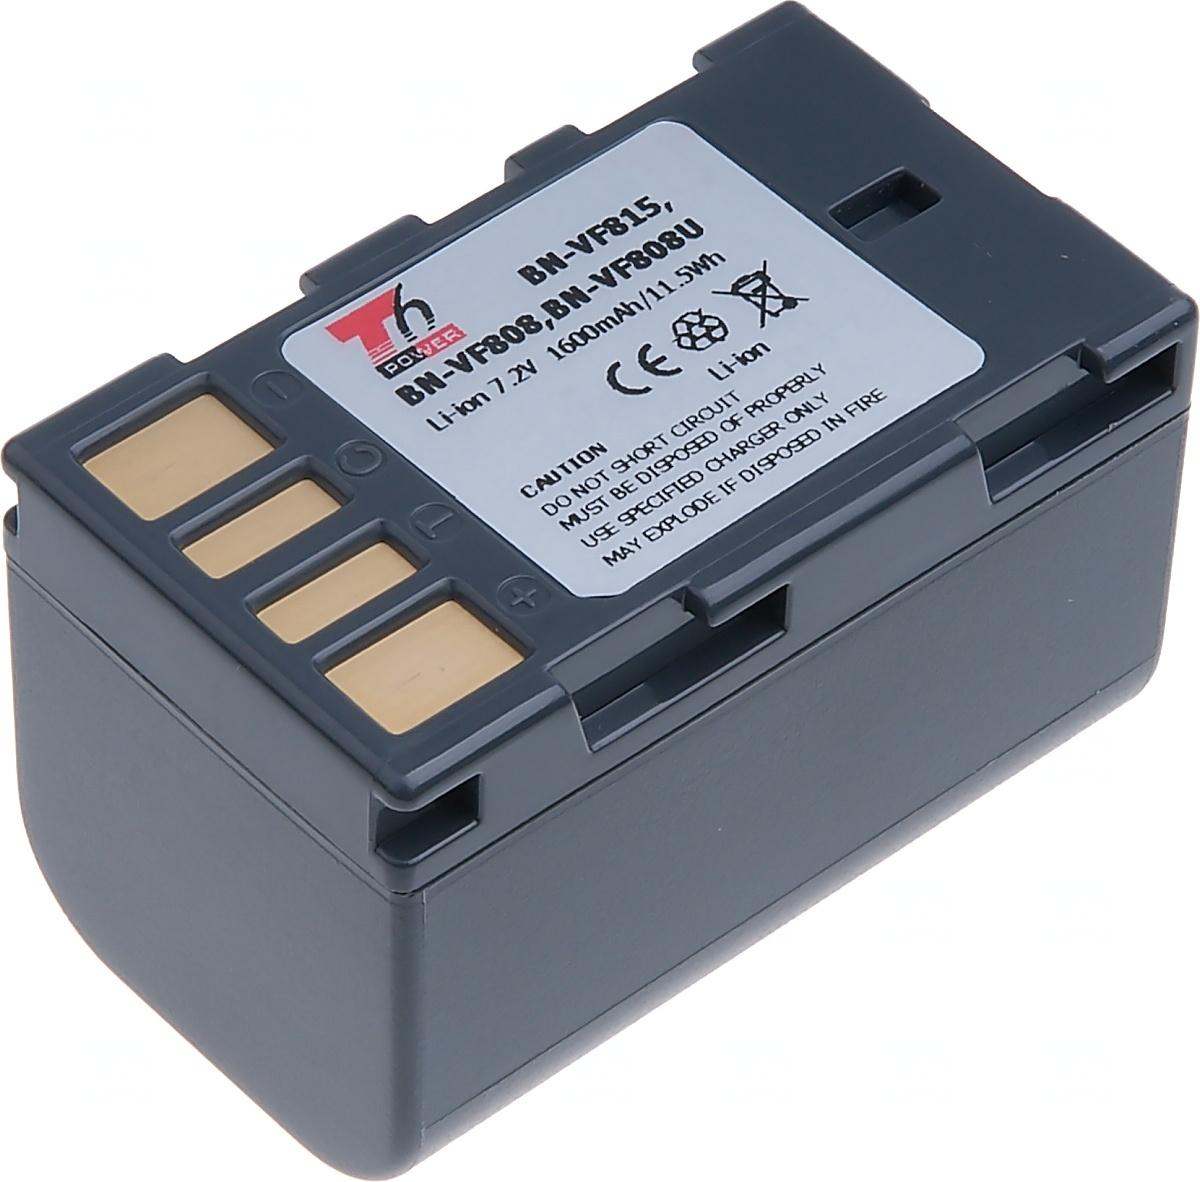 Baterie T6 power JVC BN-VF808, VF815, 1600mAh, šedá (Baterie a gripy)